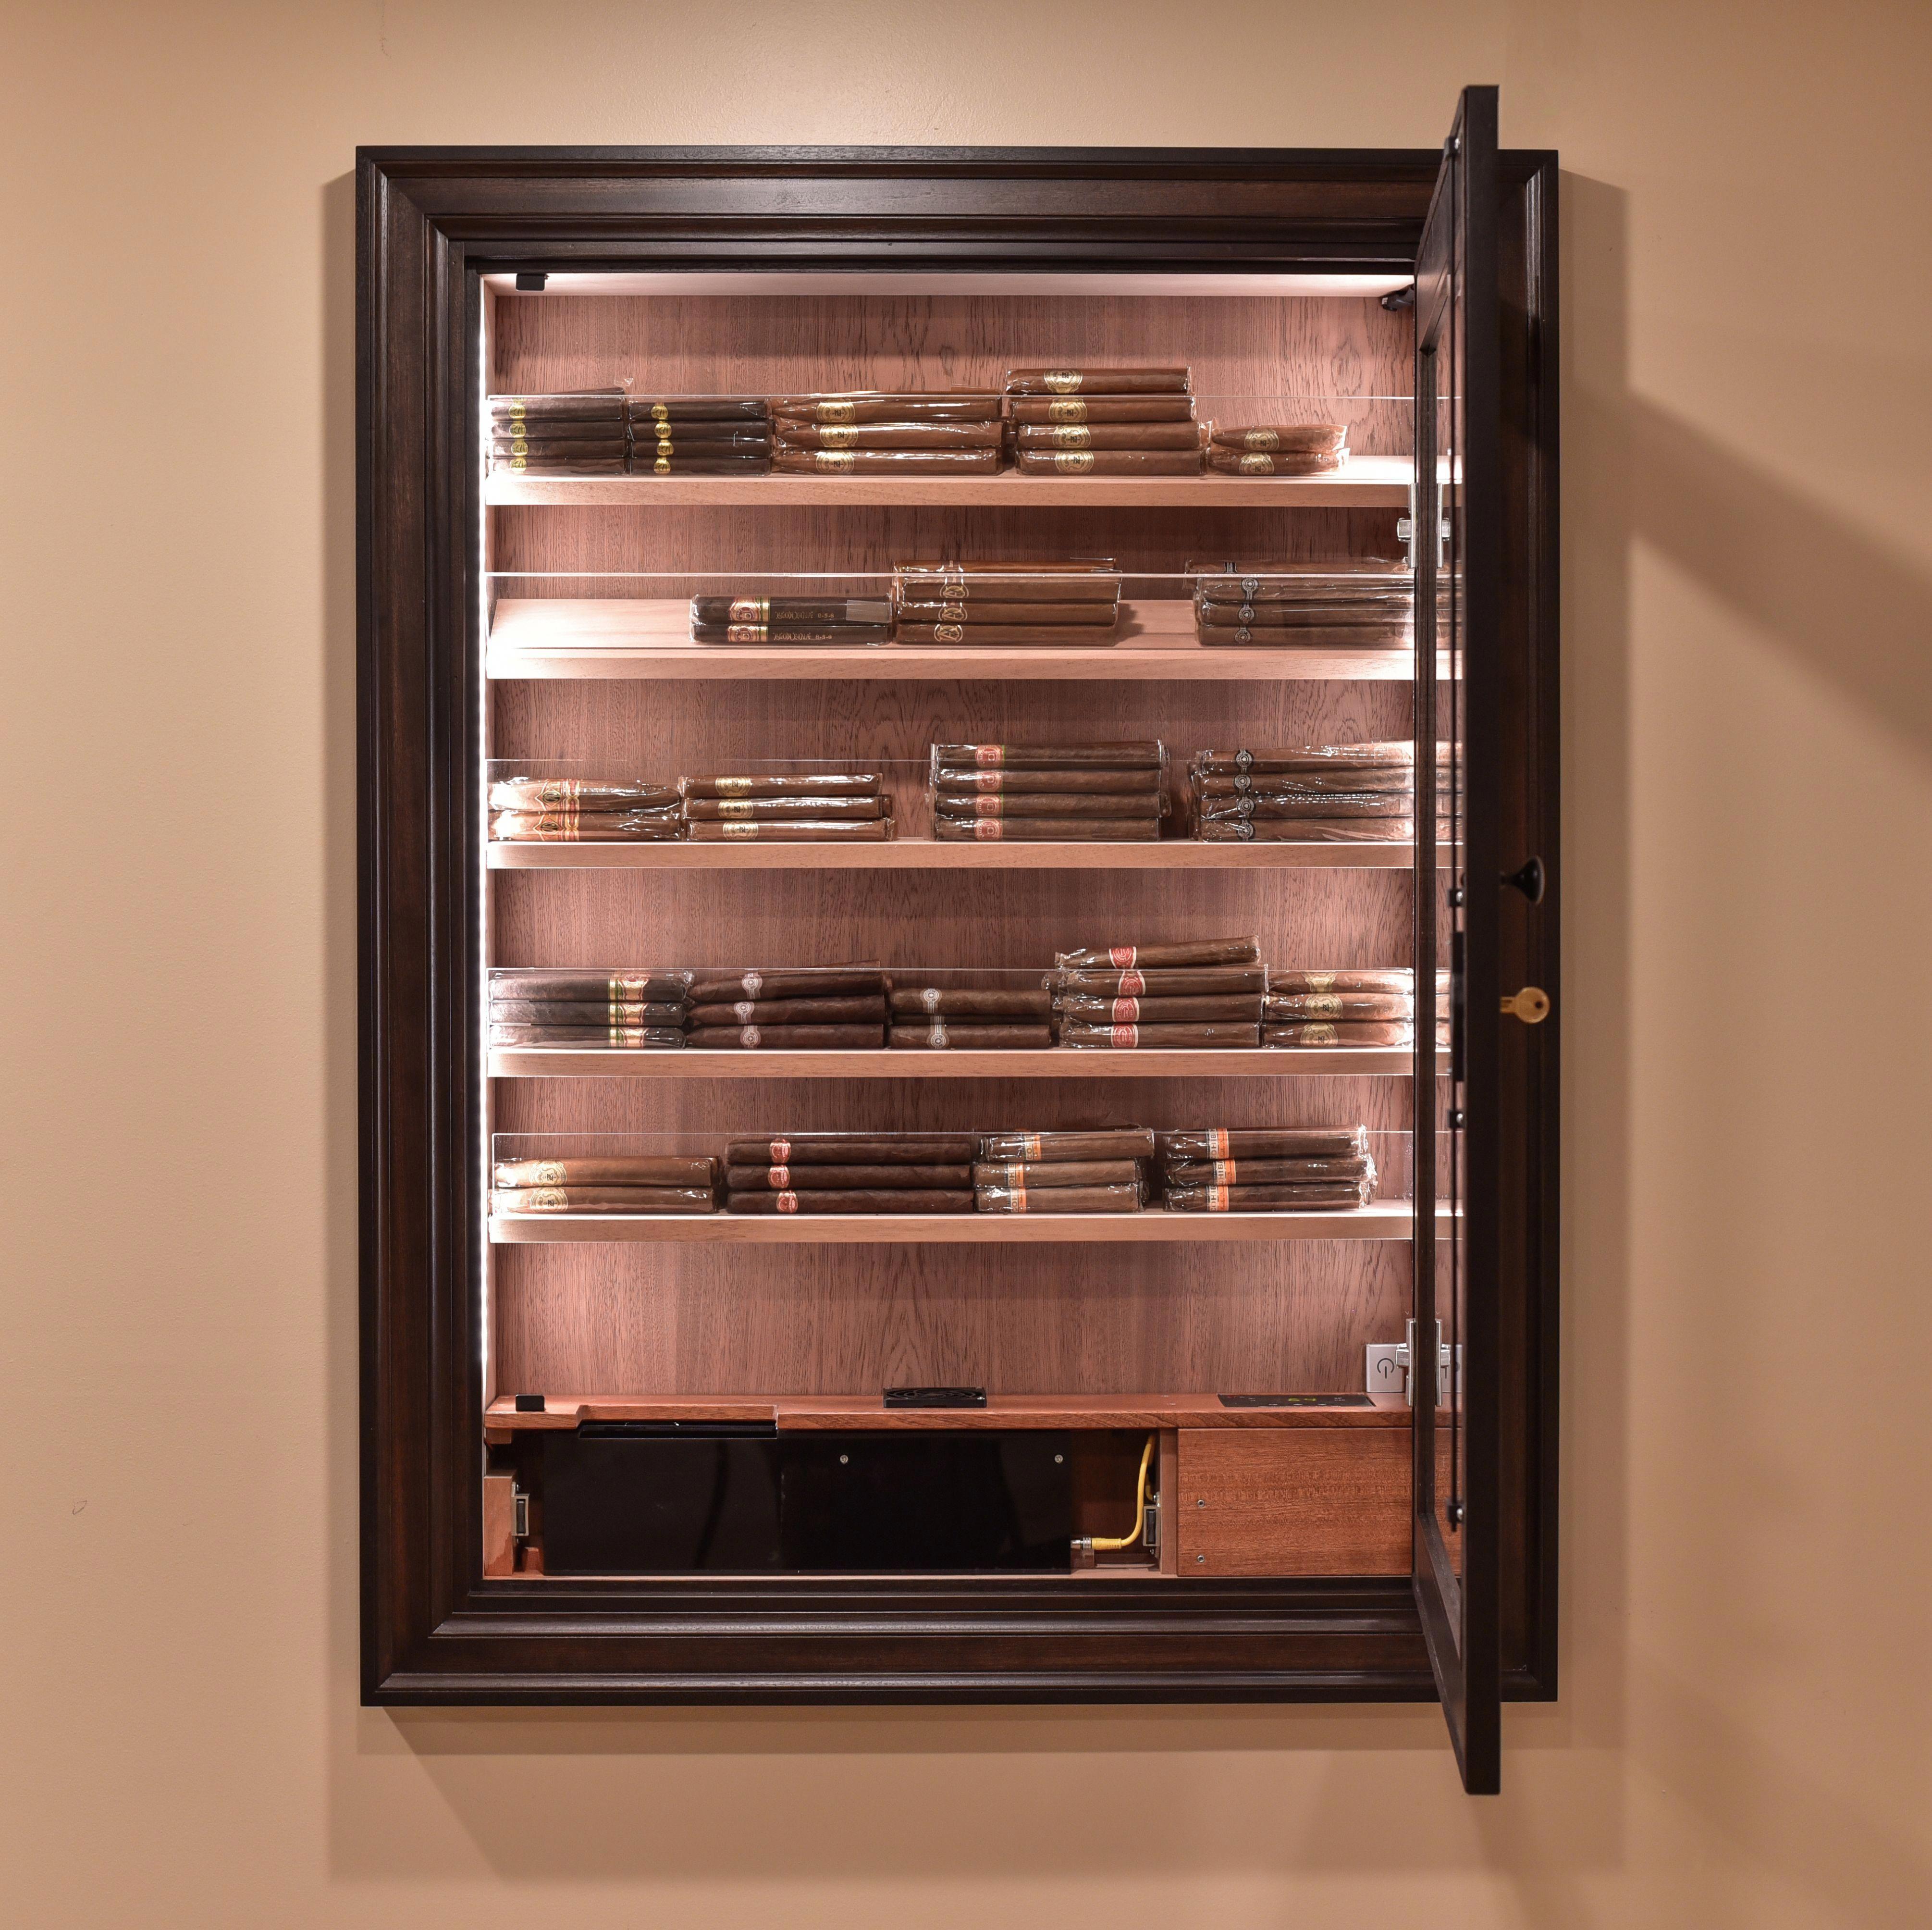 Acrylic Cigar HumidorPractical Modern and Minimalist Design